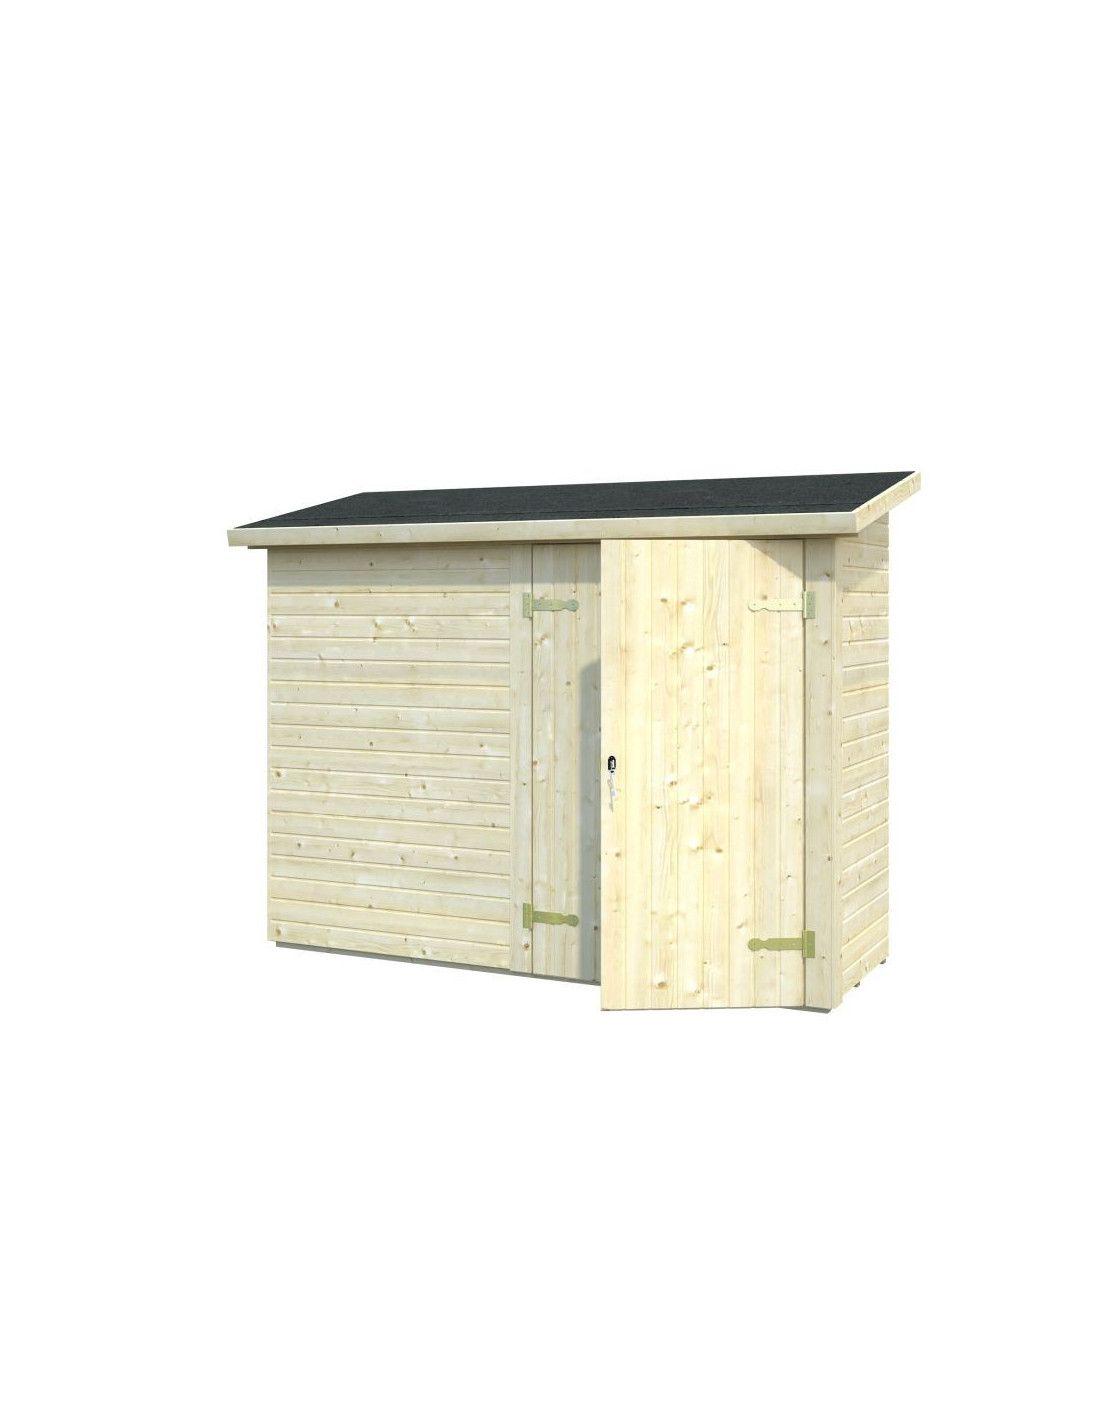 Armarios de exterior en madera mod leif 2 2 m hortum - Casetas de madera de jardin ...